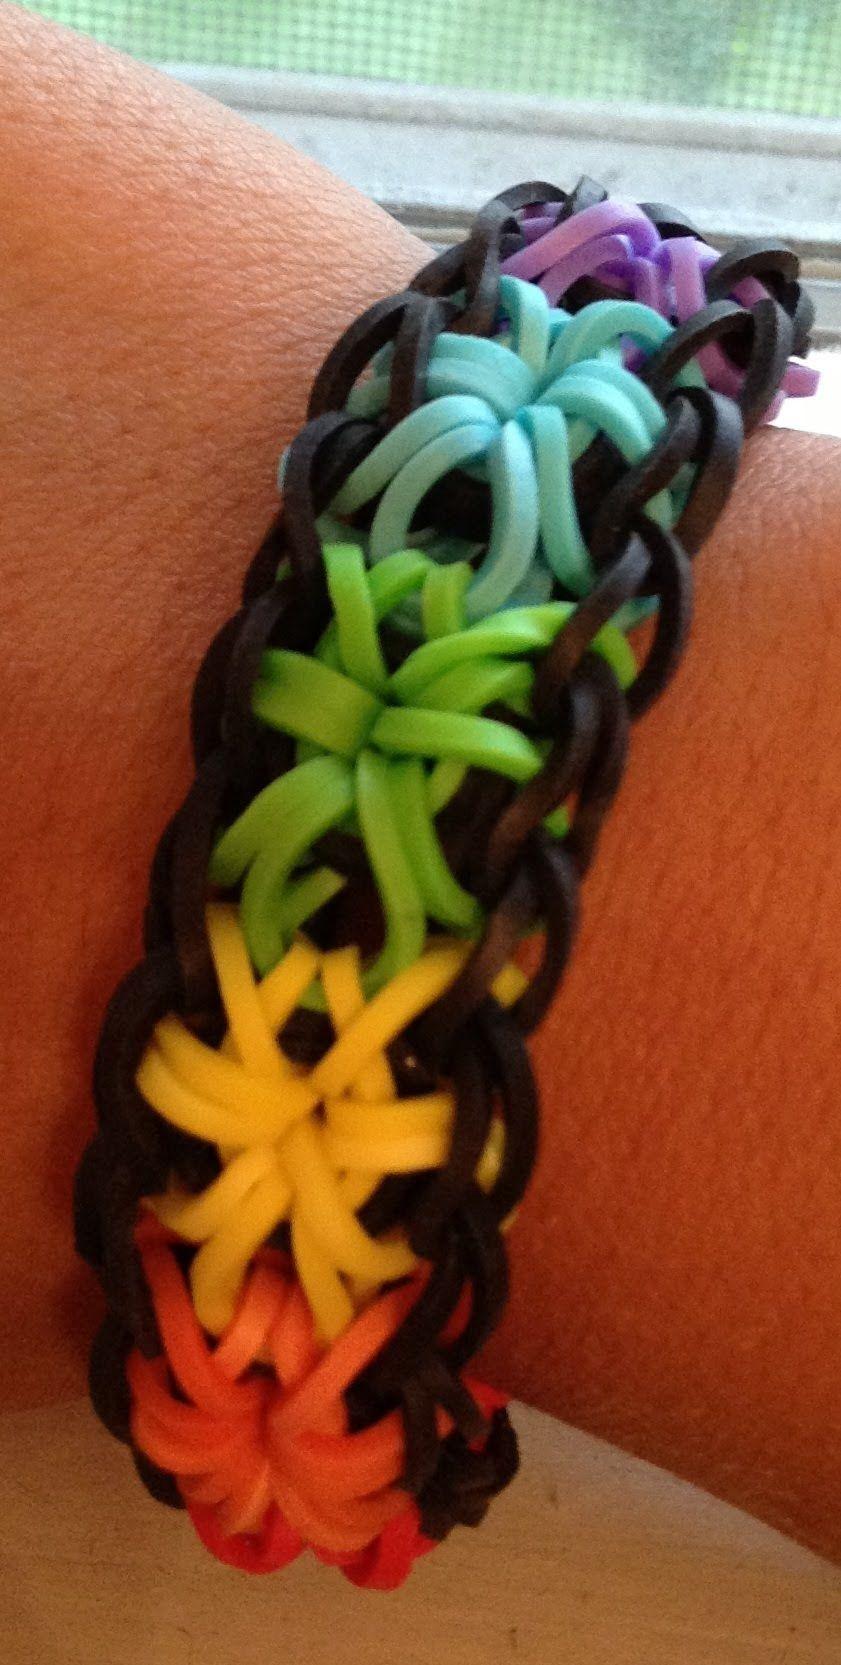 Rainbow Loom Rubber Band Bracelet Pick or Custom Made Starburst